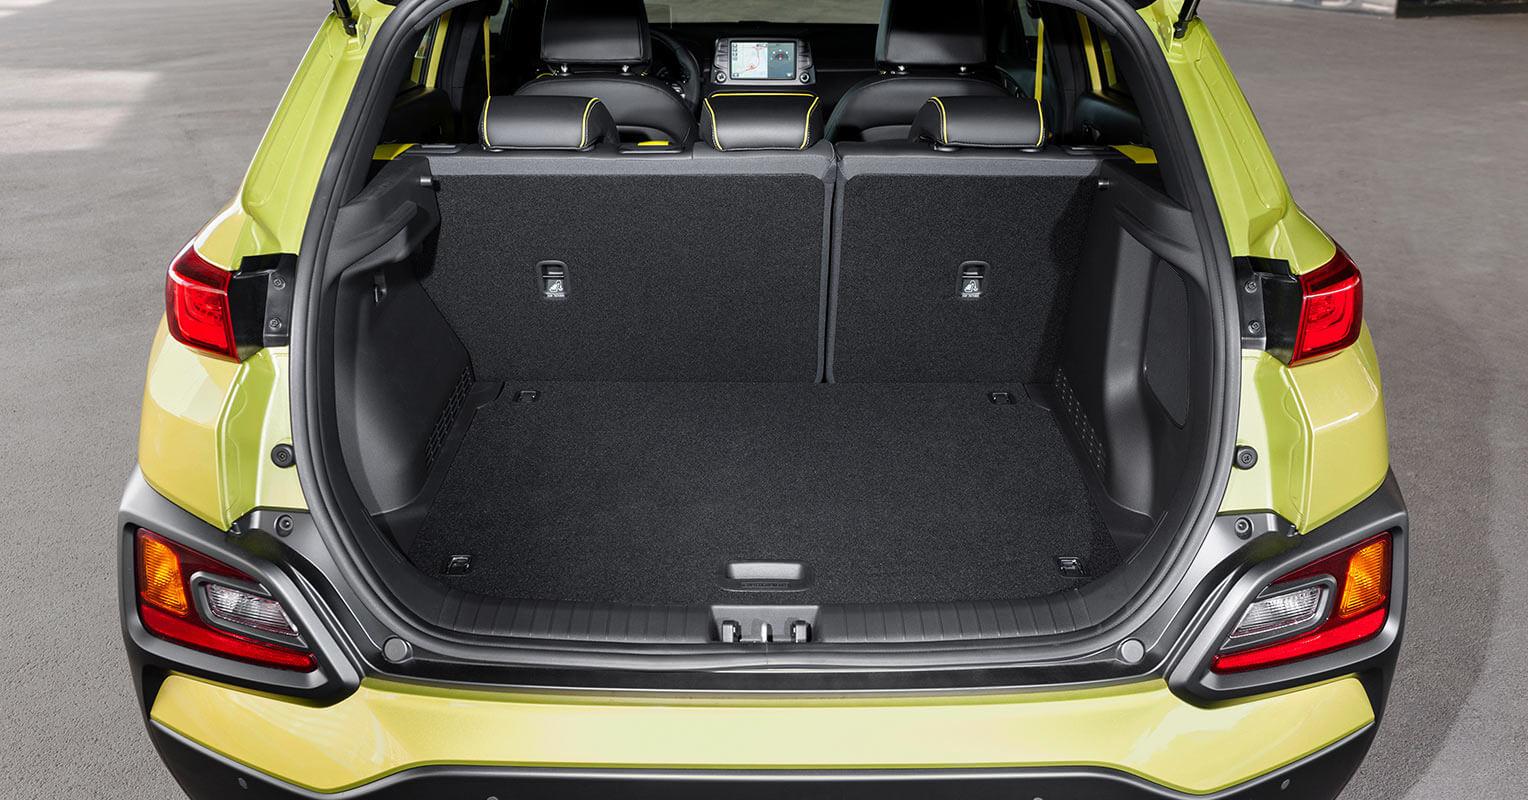 Hyundai Kona maletero